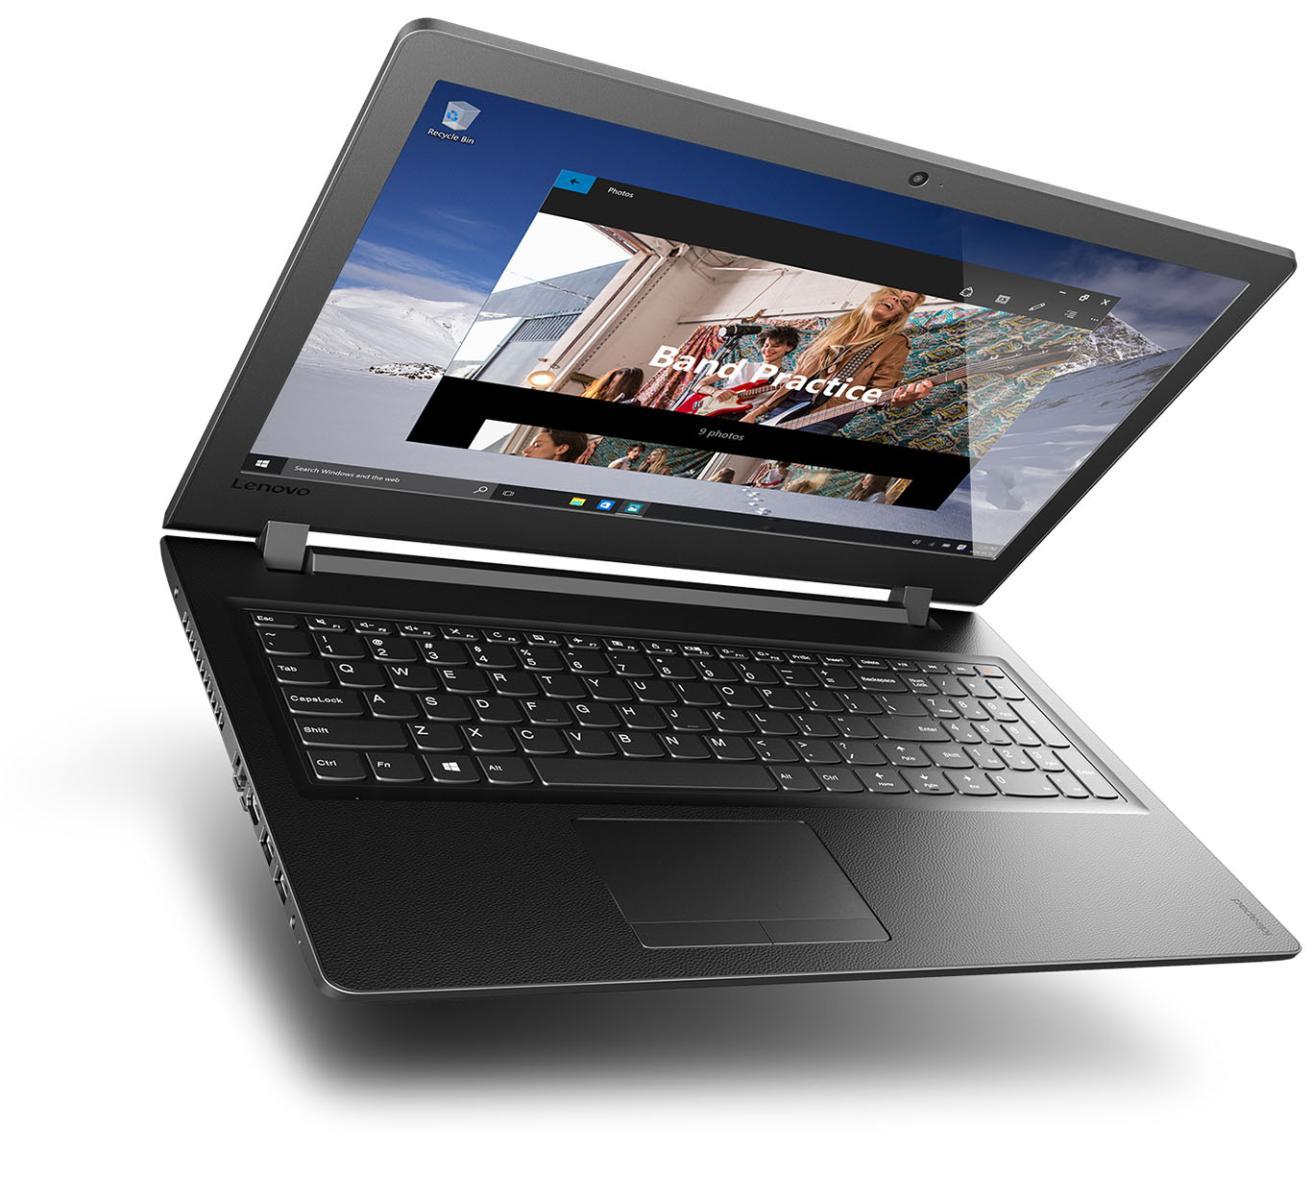 Фото  Ноутбук Lenovo ideapad 110-15IBR Black Texture (80T7004QRA)